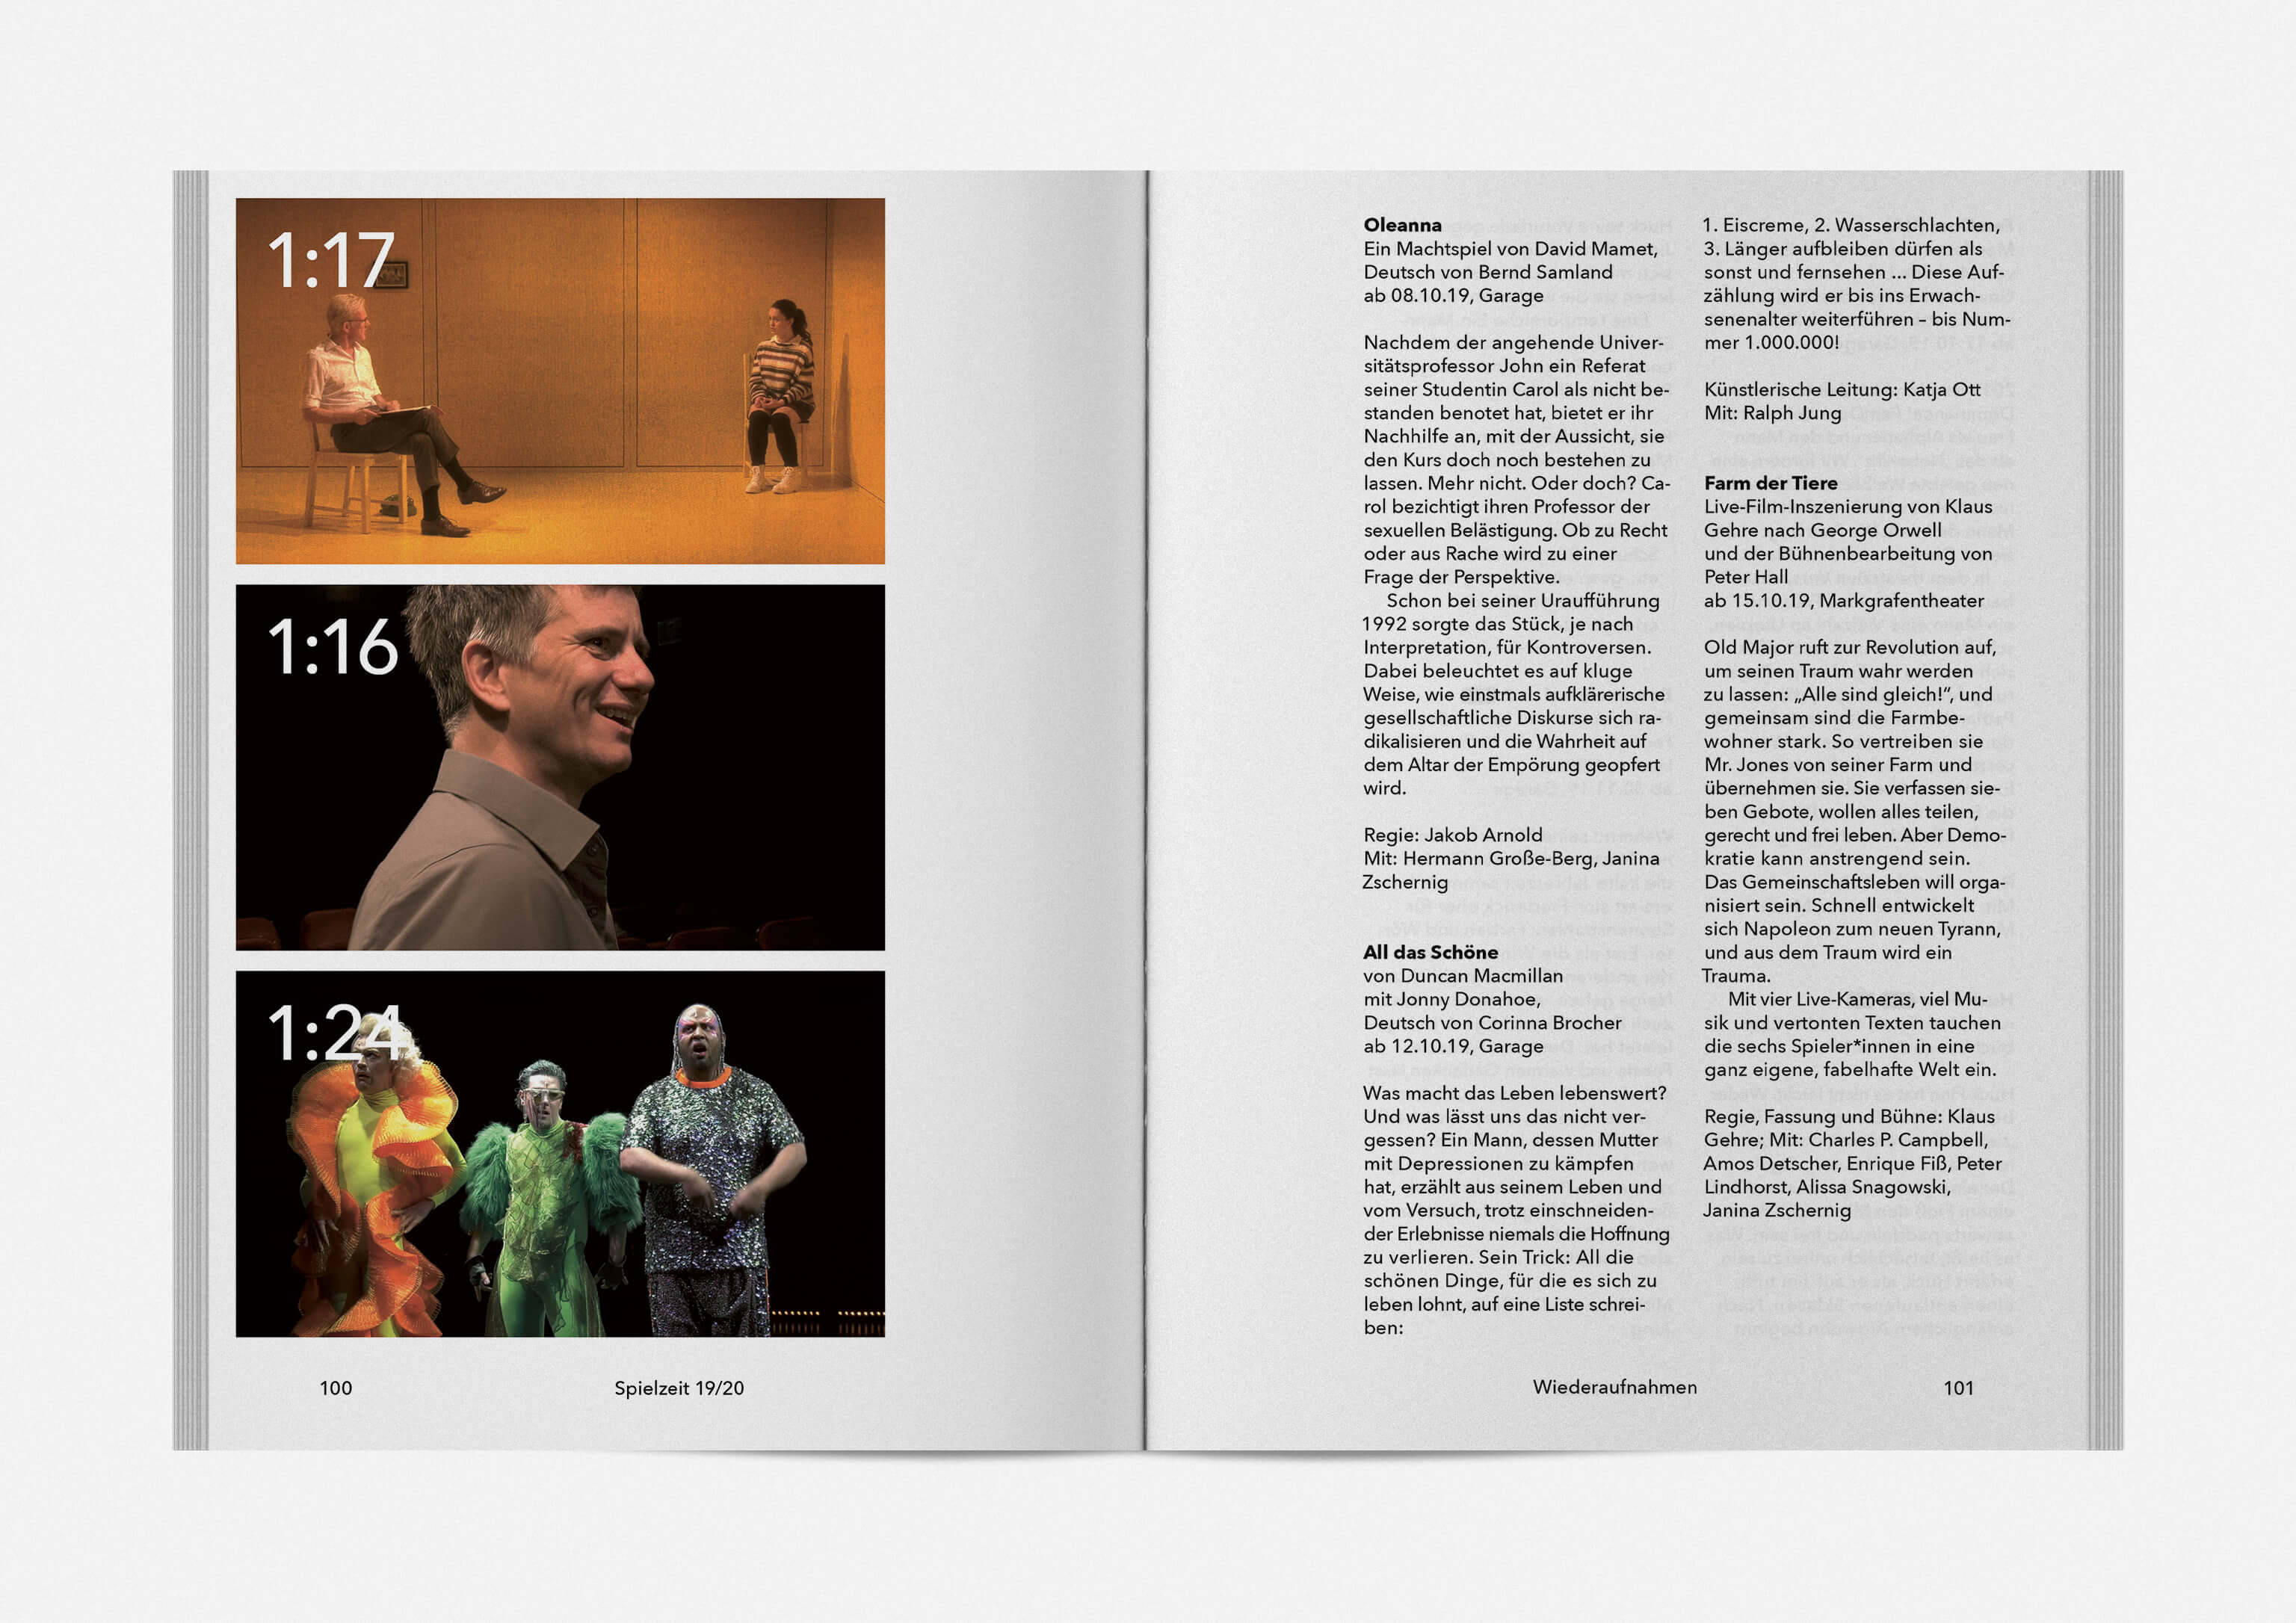 https://neuegestaltung.de/media/pages/clients/theater-erlangen-season-program-19-20/7397e74ea9-1597415336/te_szh_19_20_innenseite_100_101_ng.jpg